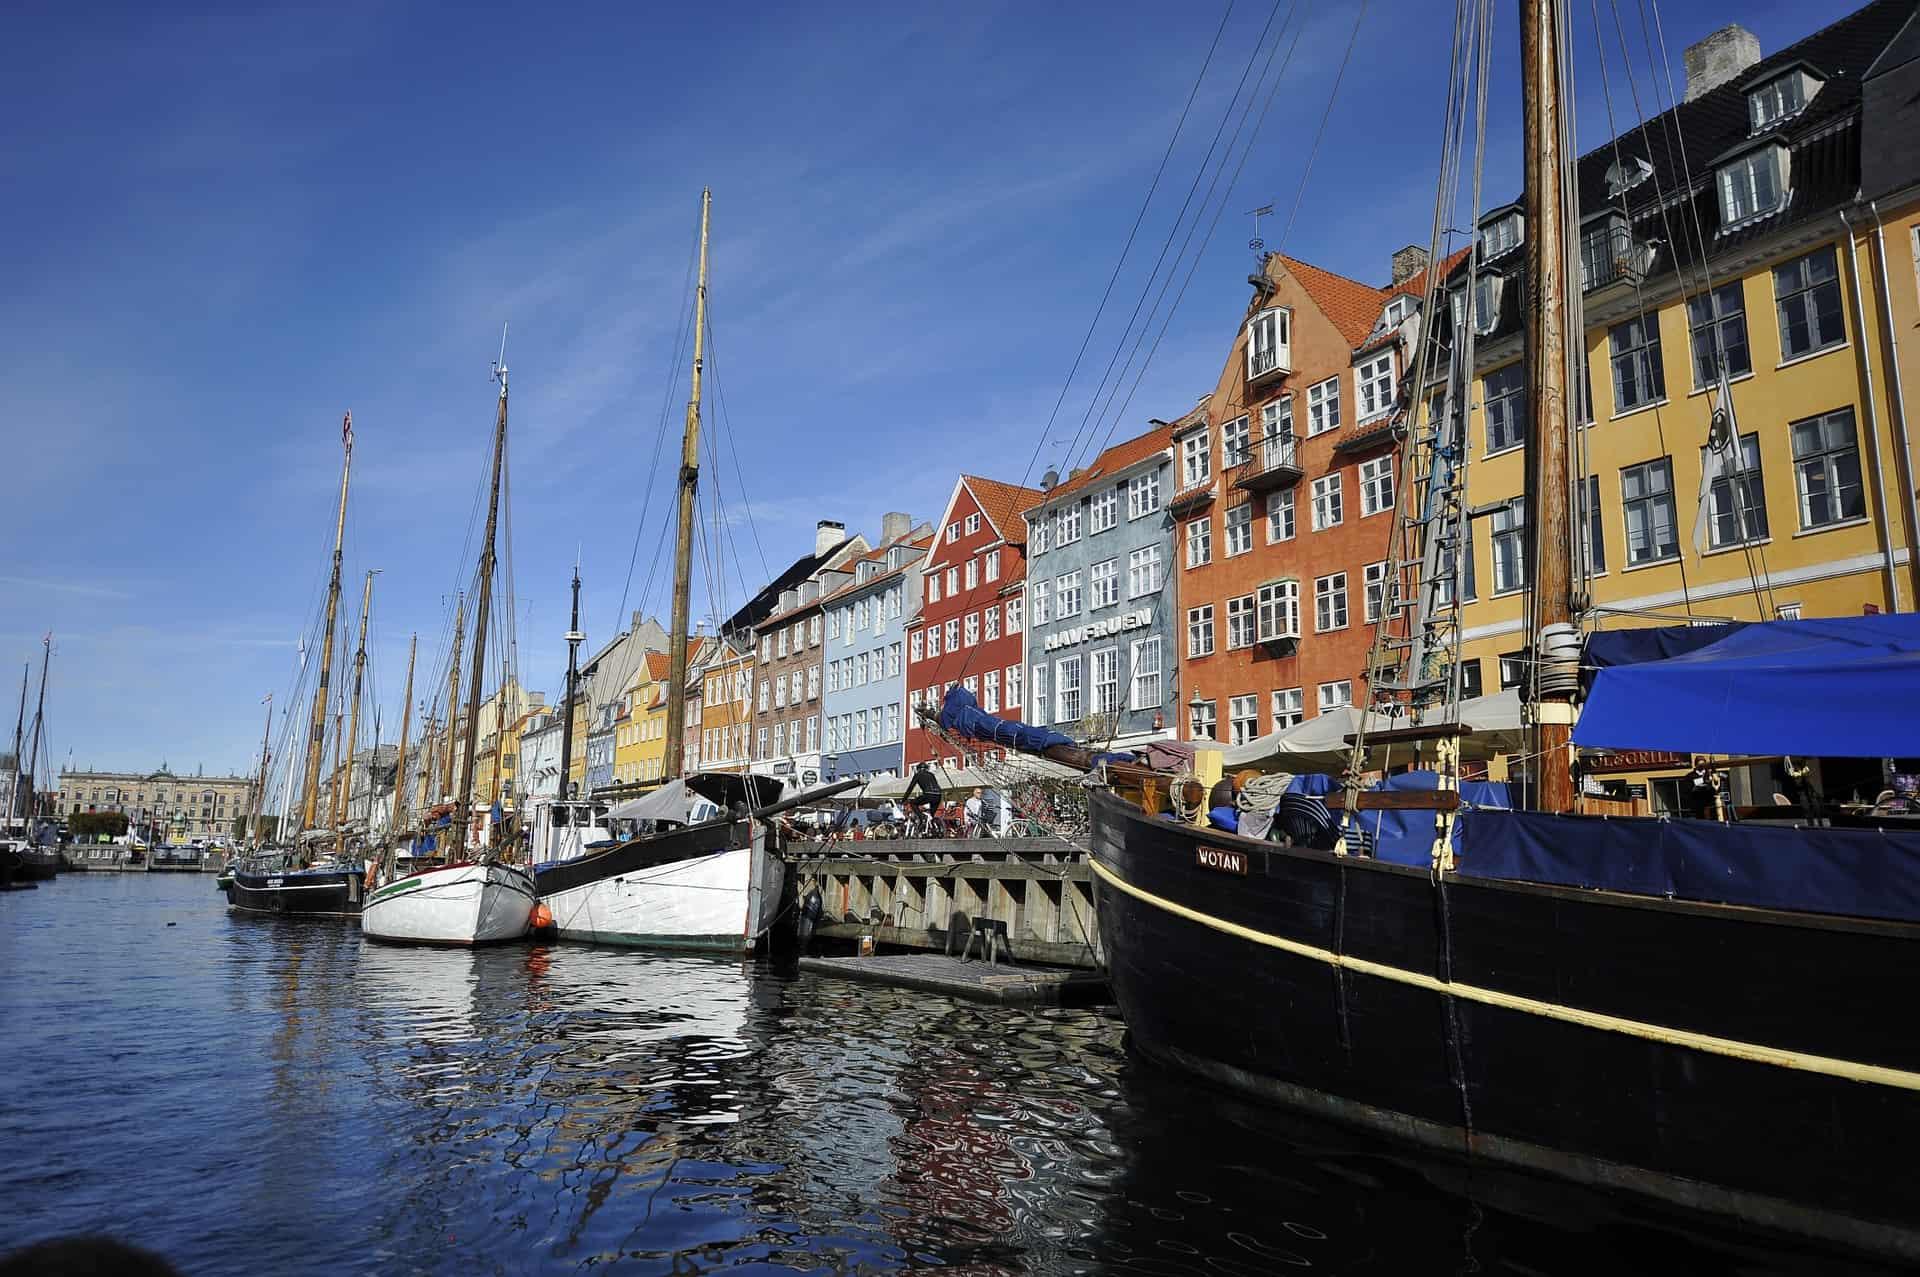 Kopenhagen Dänemark Urlaub günstig buchen